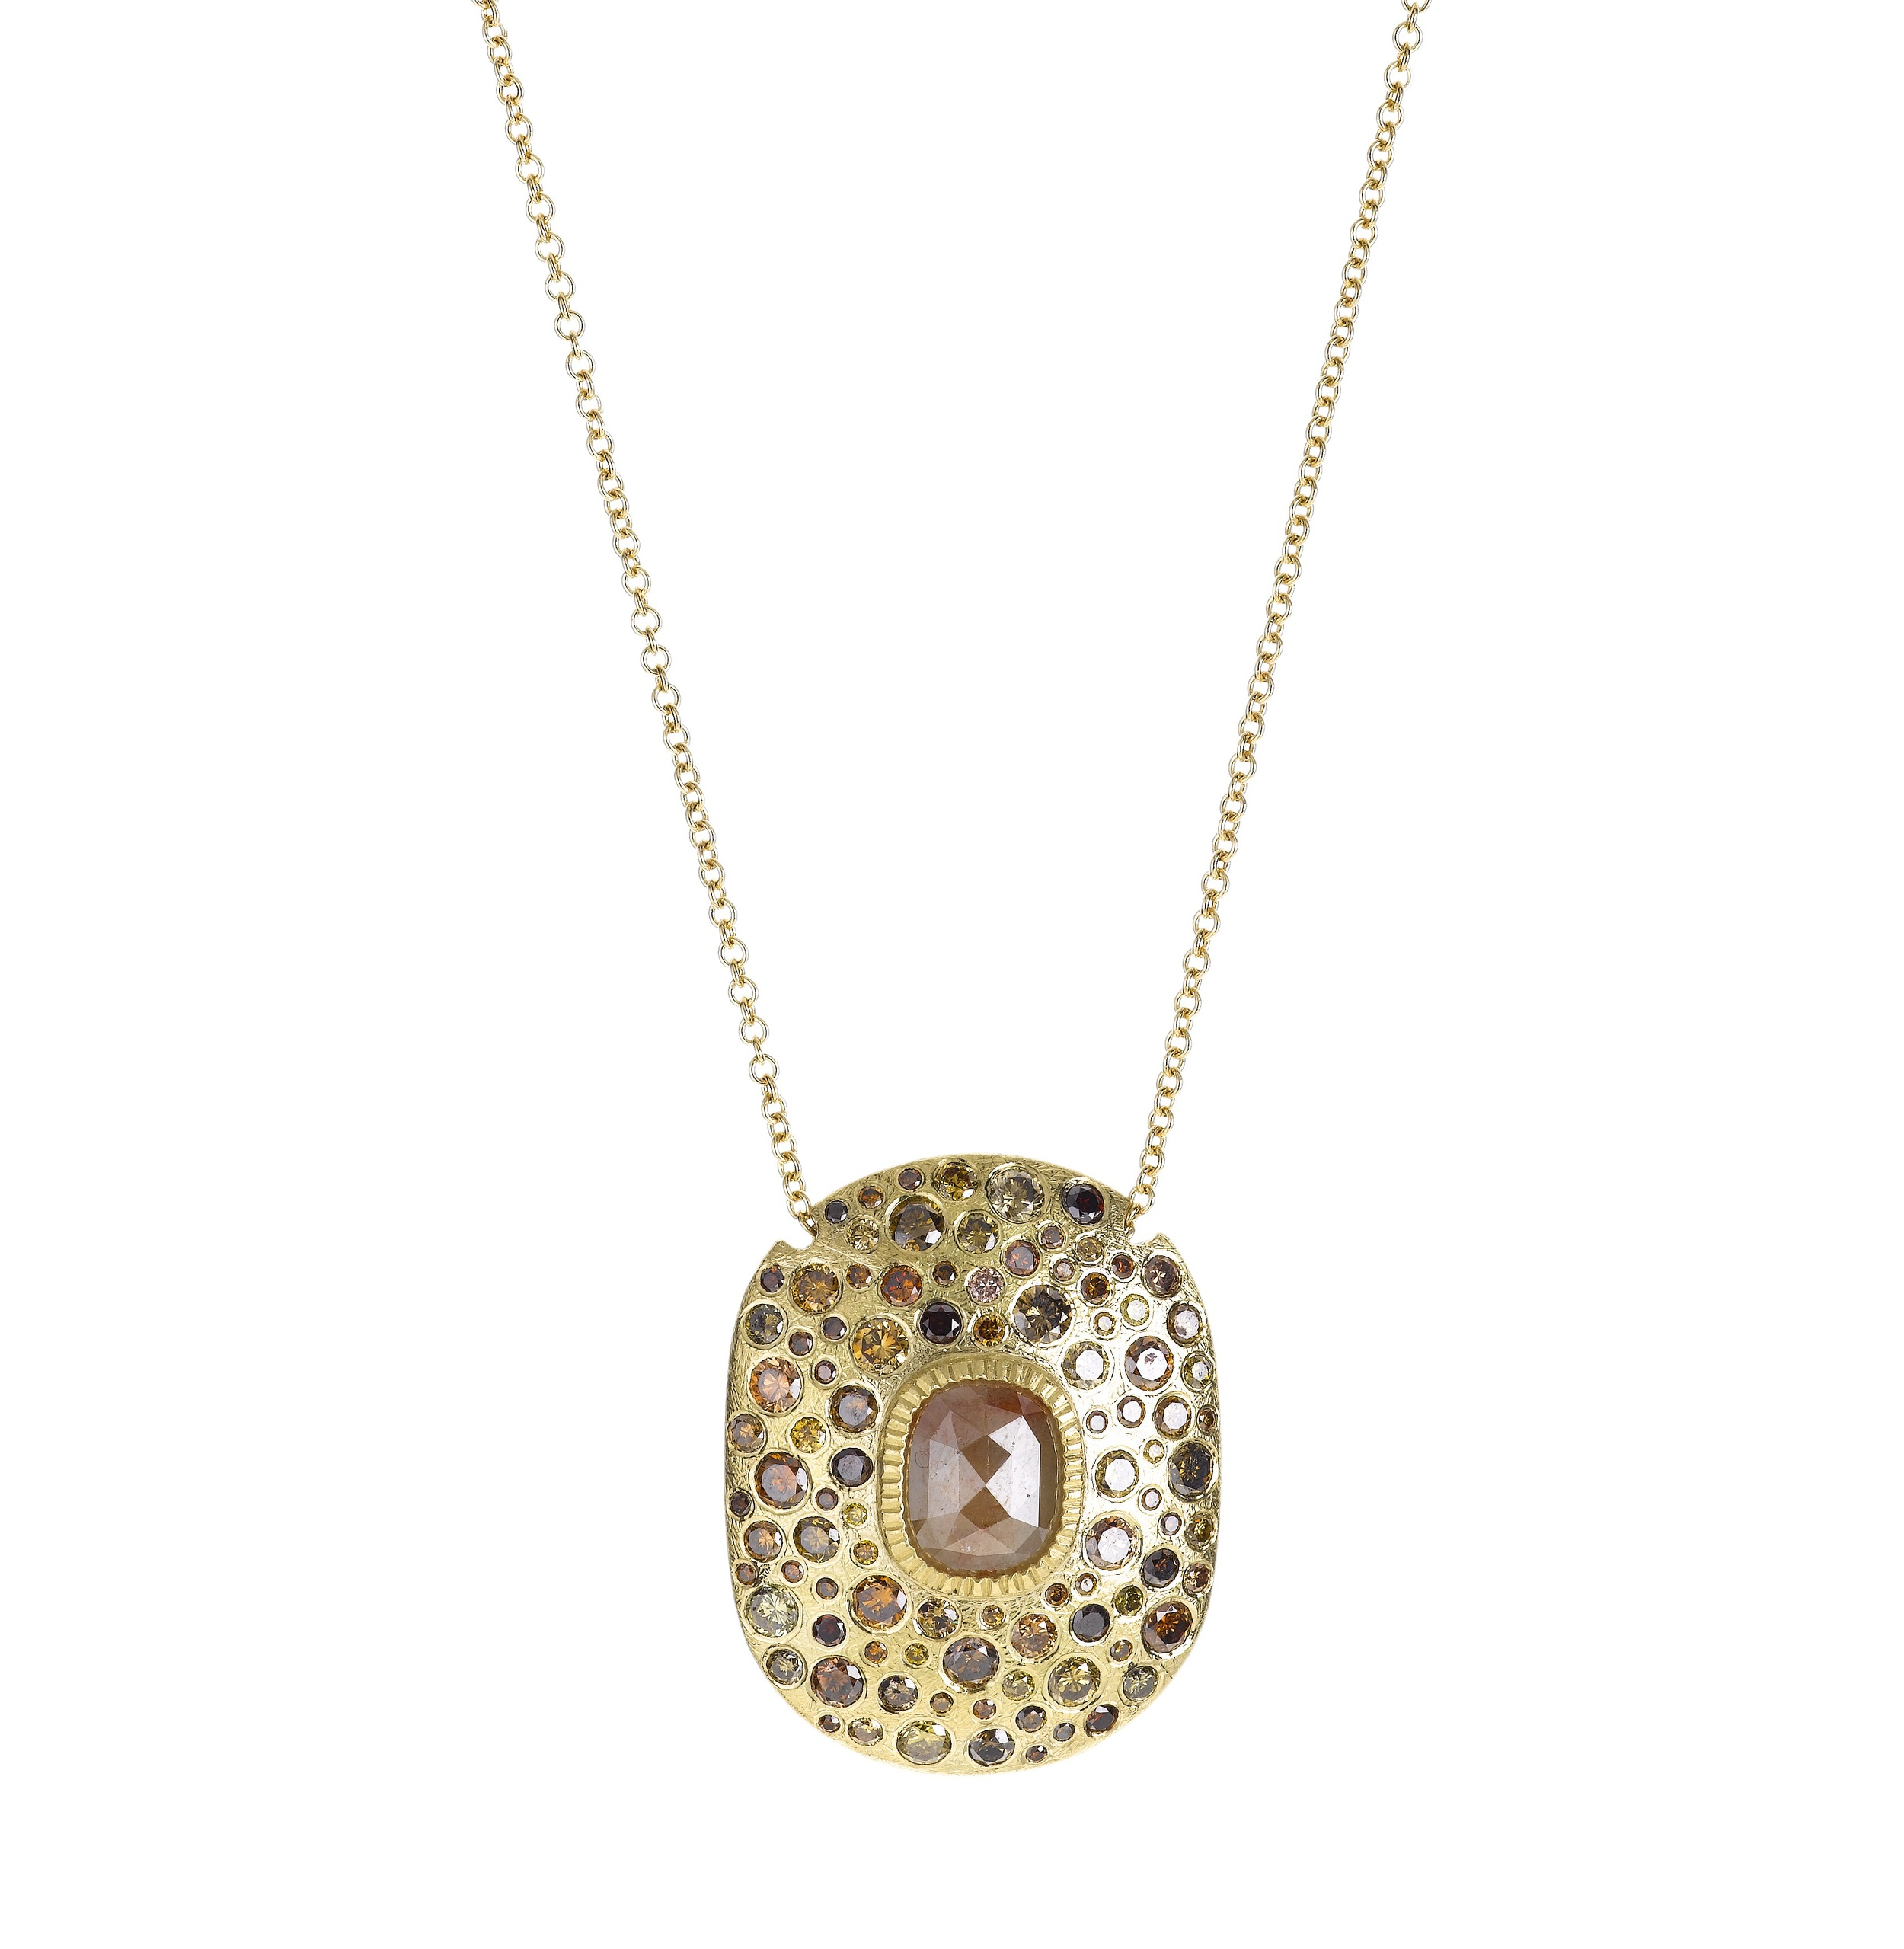 Pendant in18k yellow gold, orange fancy cut diamond (1.075ctw), autumn brilliant cut diamonds (1.83ctw), raw diamond cube (0.115ctw), $16,720,  available at Todd Reed .